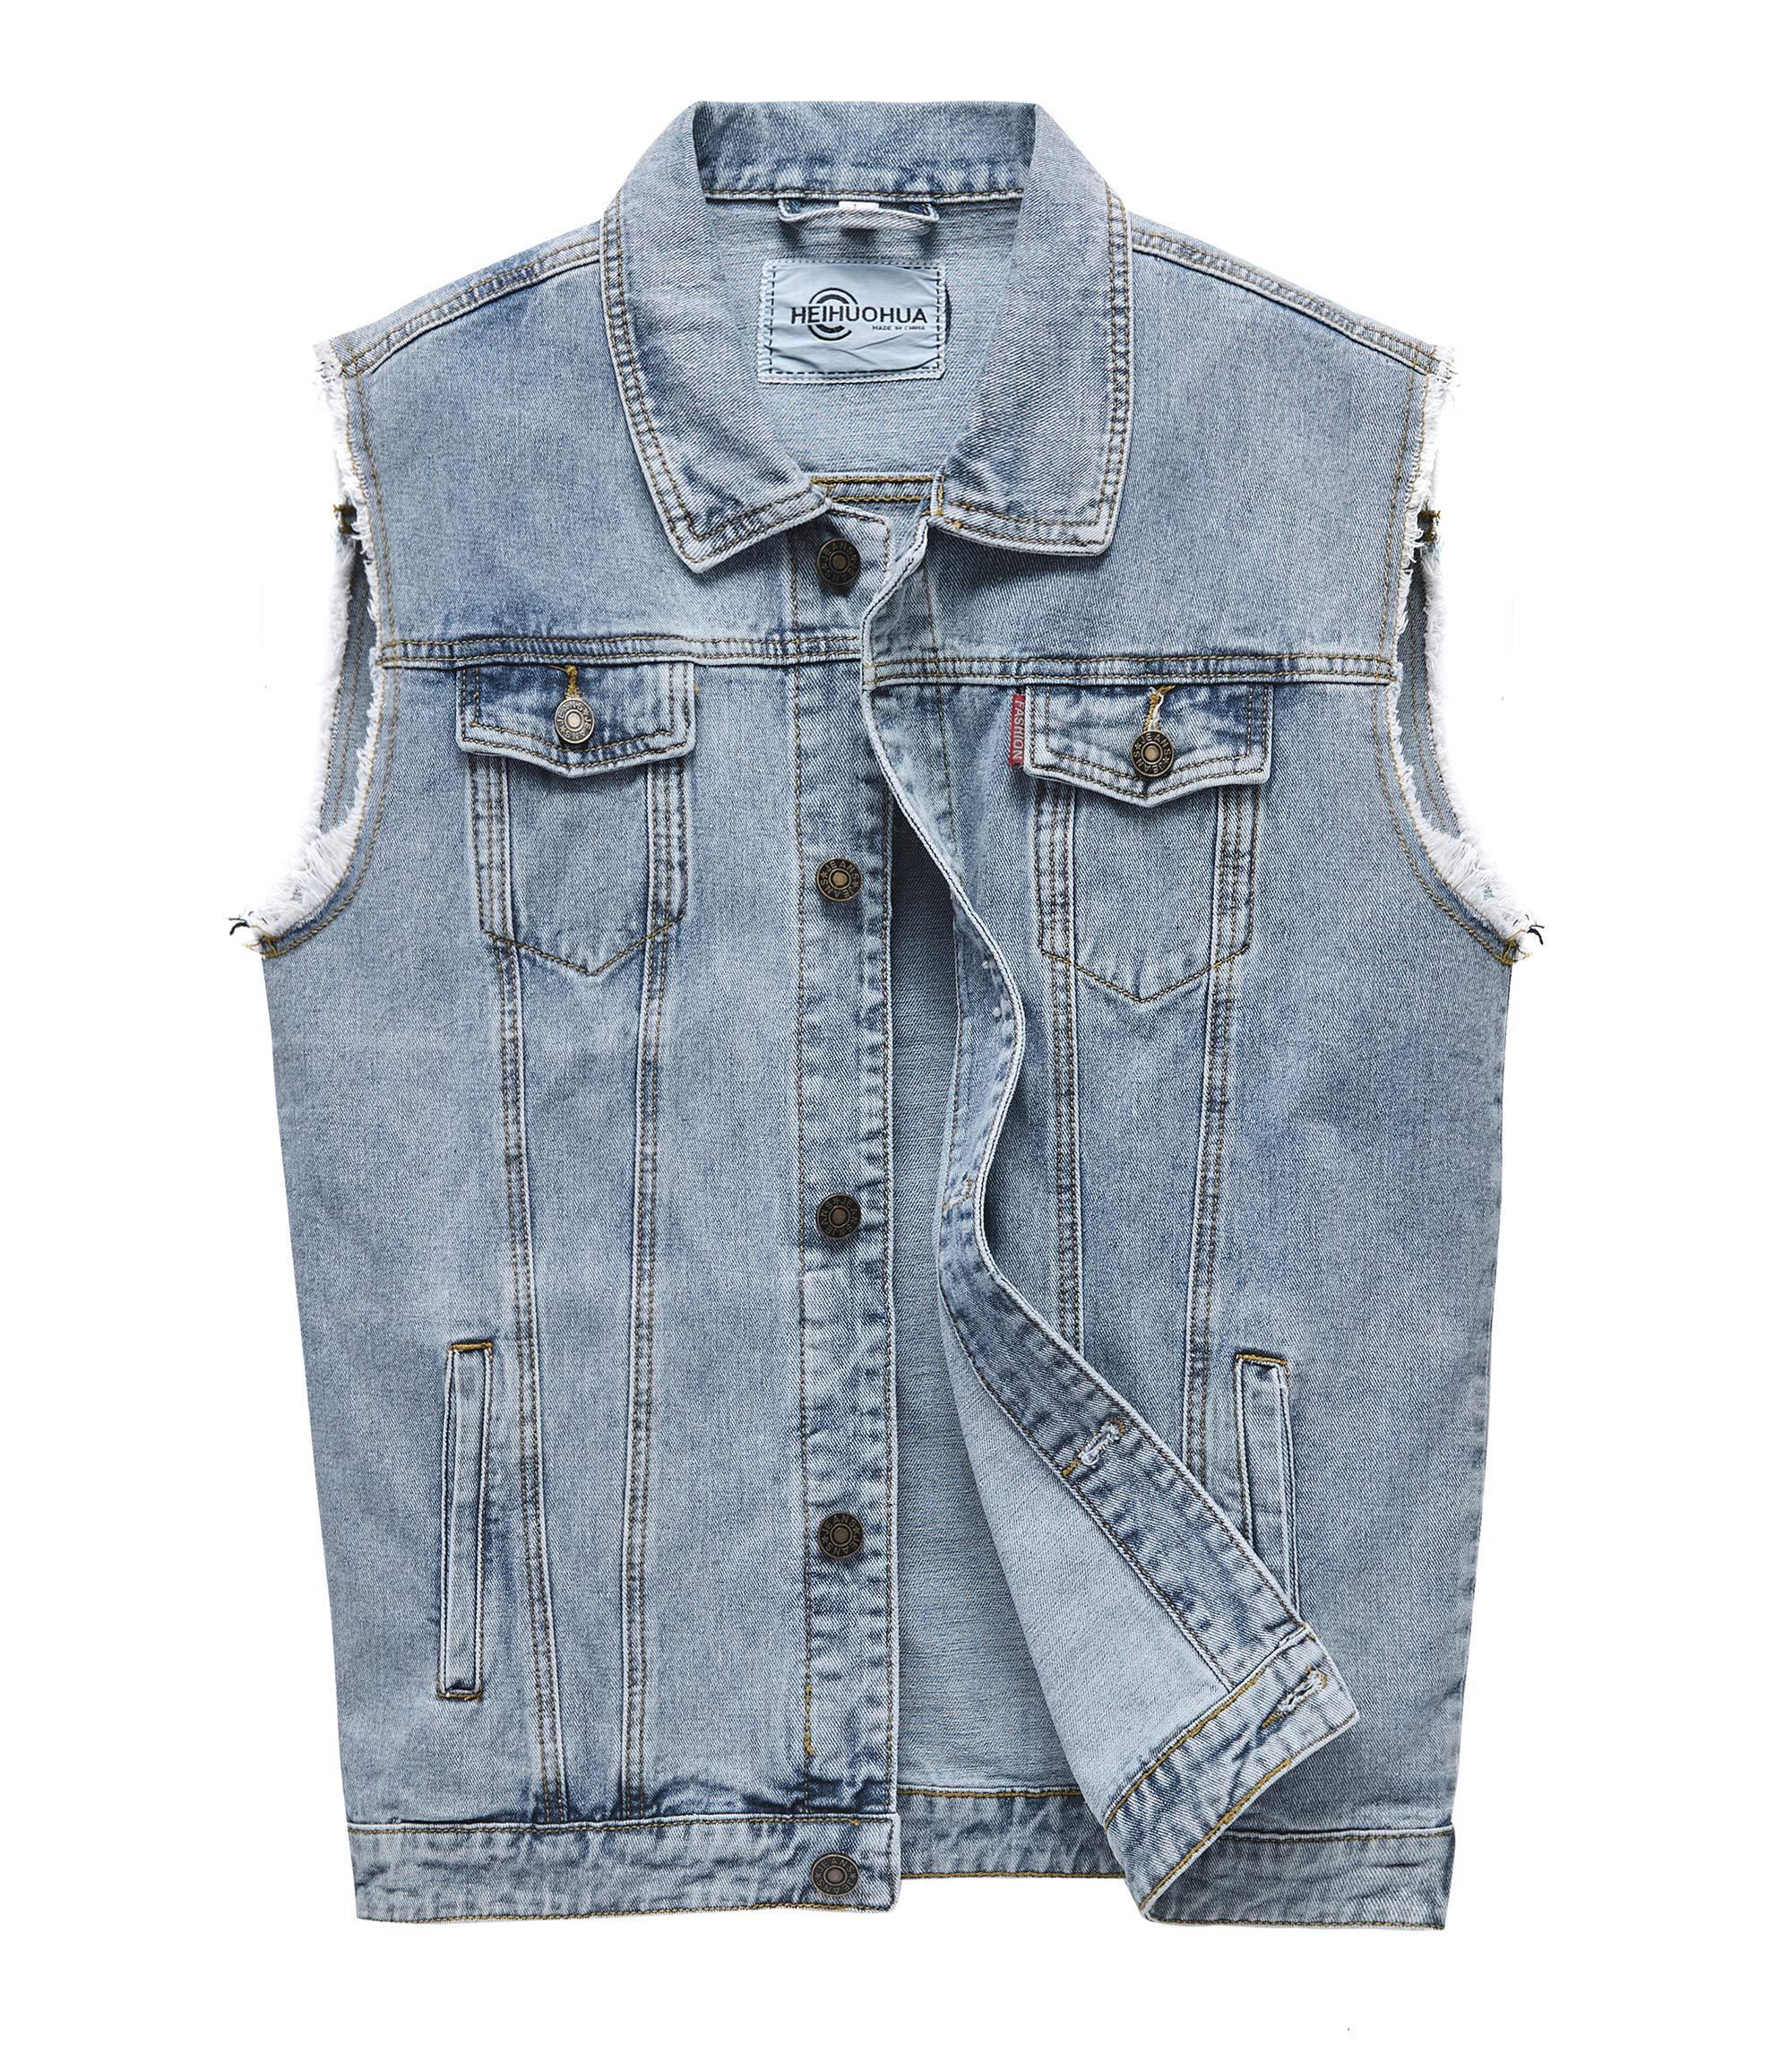 Heihuohua Men's Casual Button-Down Denim Vest Trucker Jean Jacket (X-Large, Denim Blue) by Heihuohua